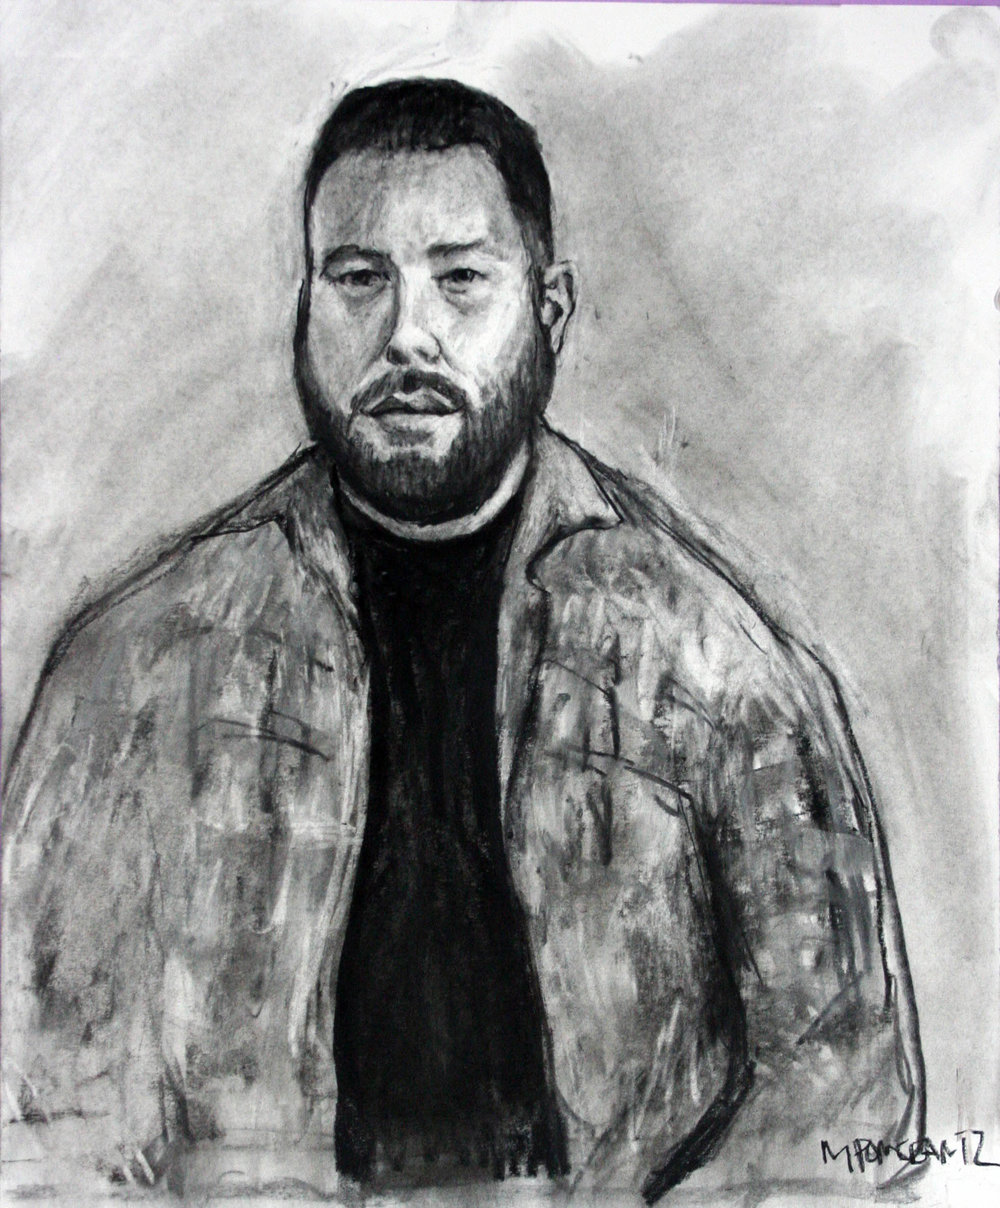 Michael Pomerantz did this charcoal drawing.